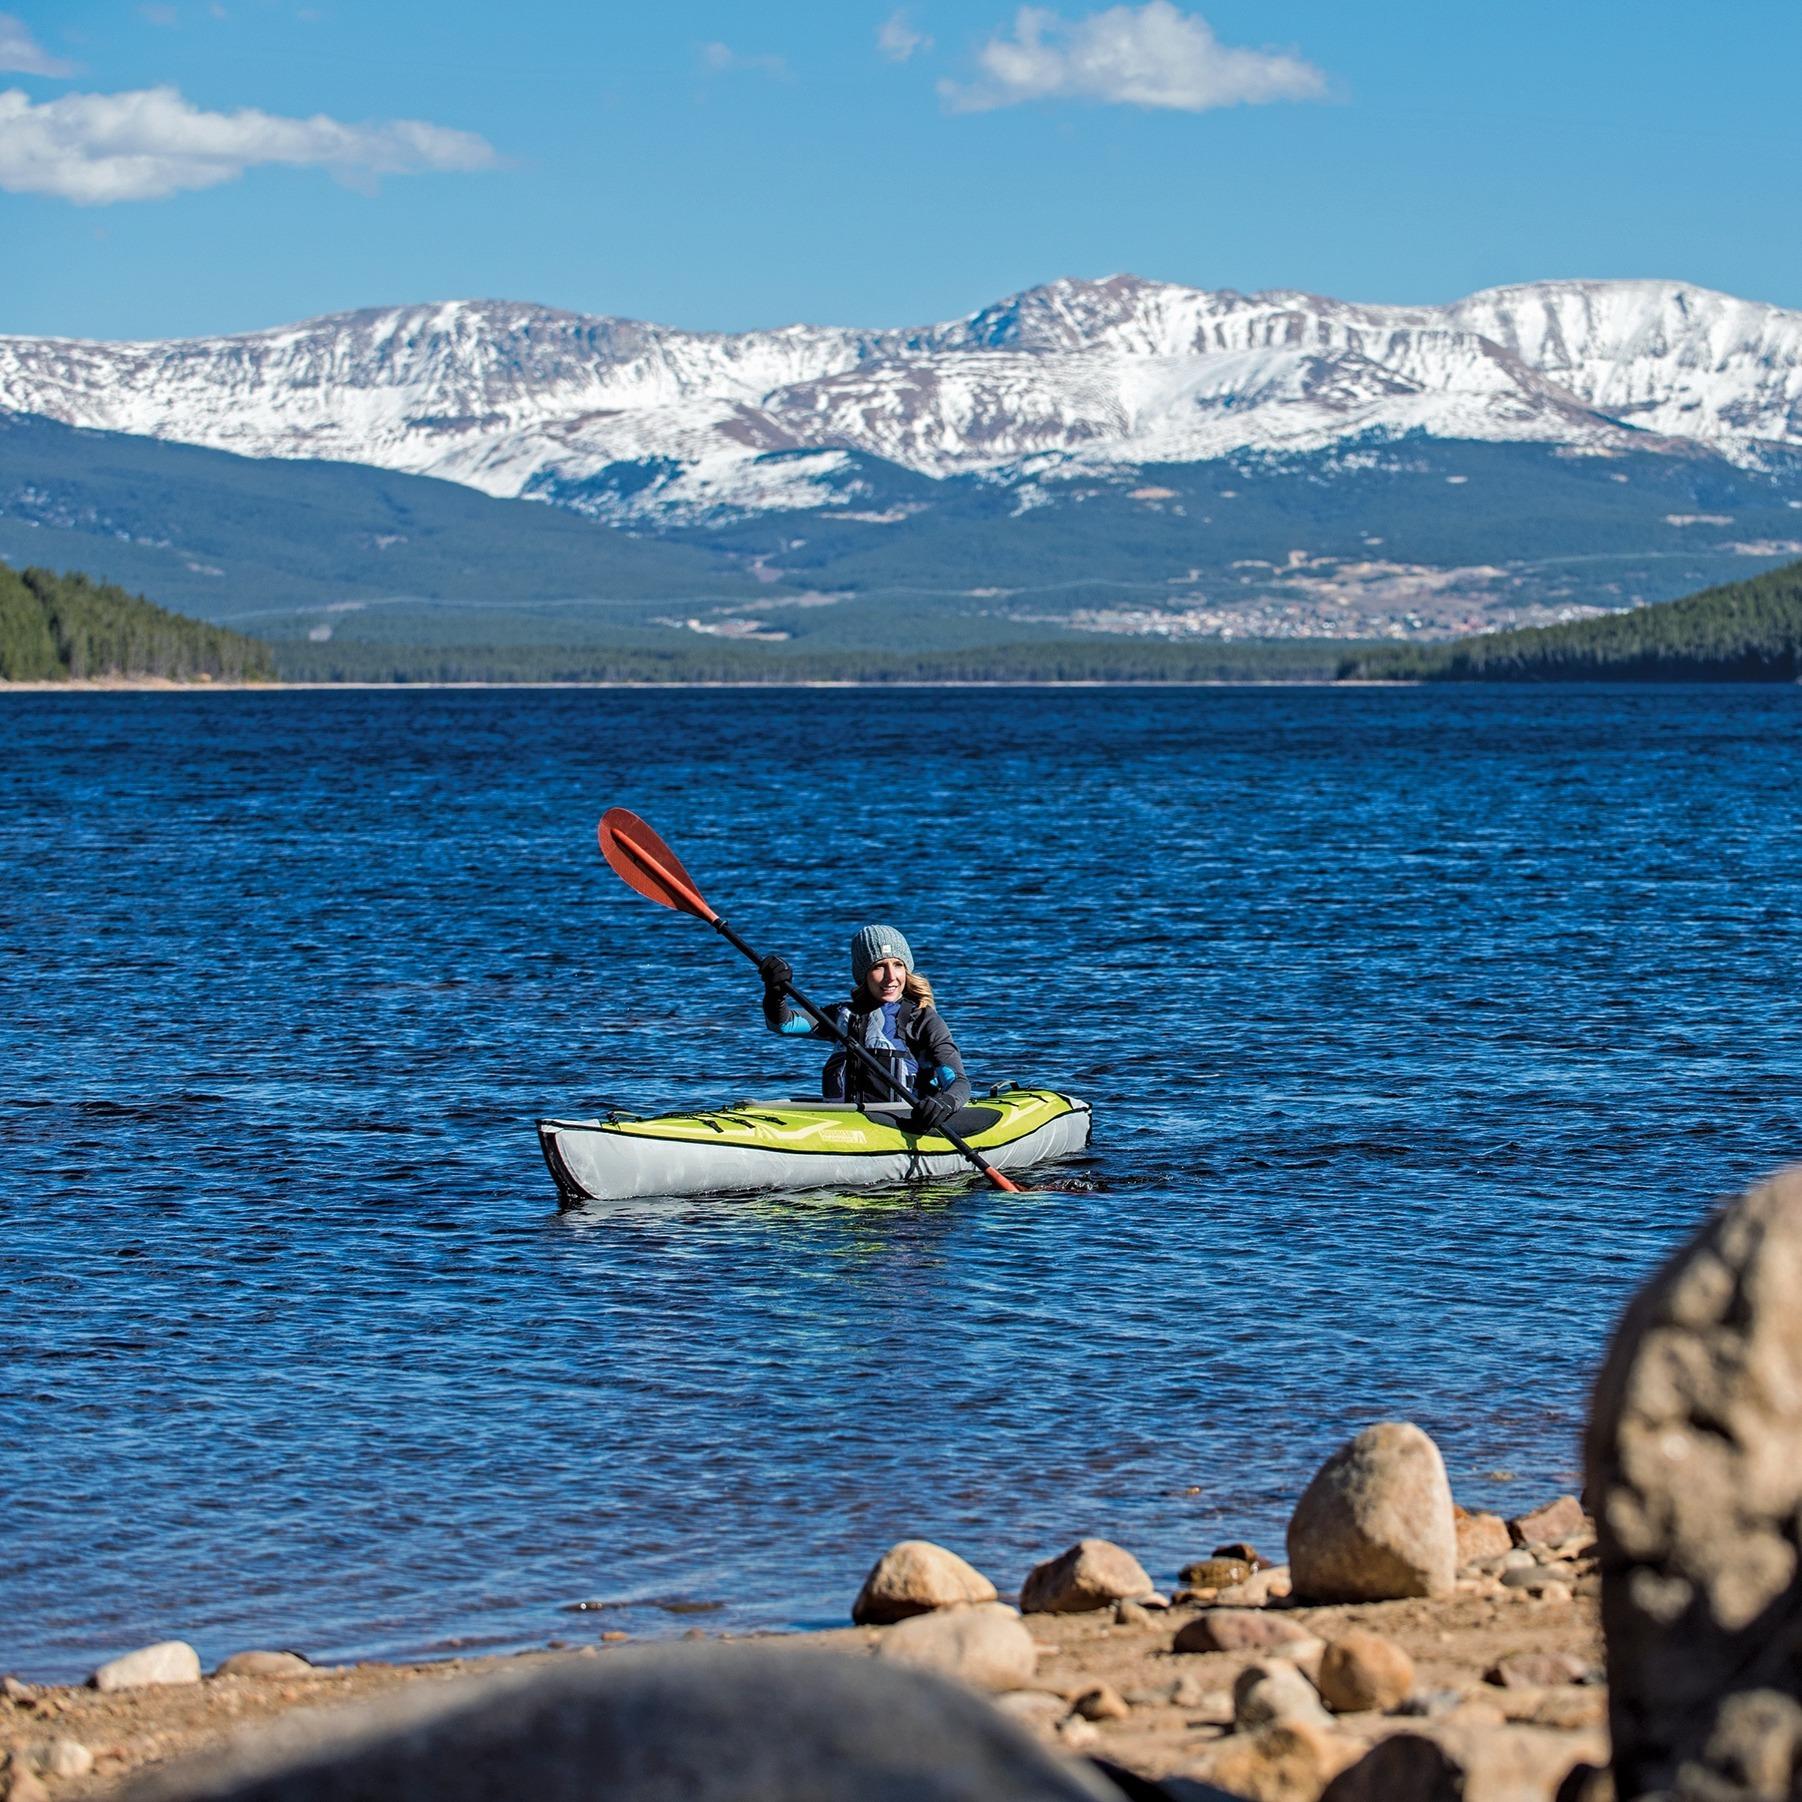 Day Touring Advancedframe® ultralight inflatable kayak, single